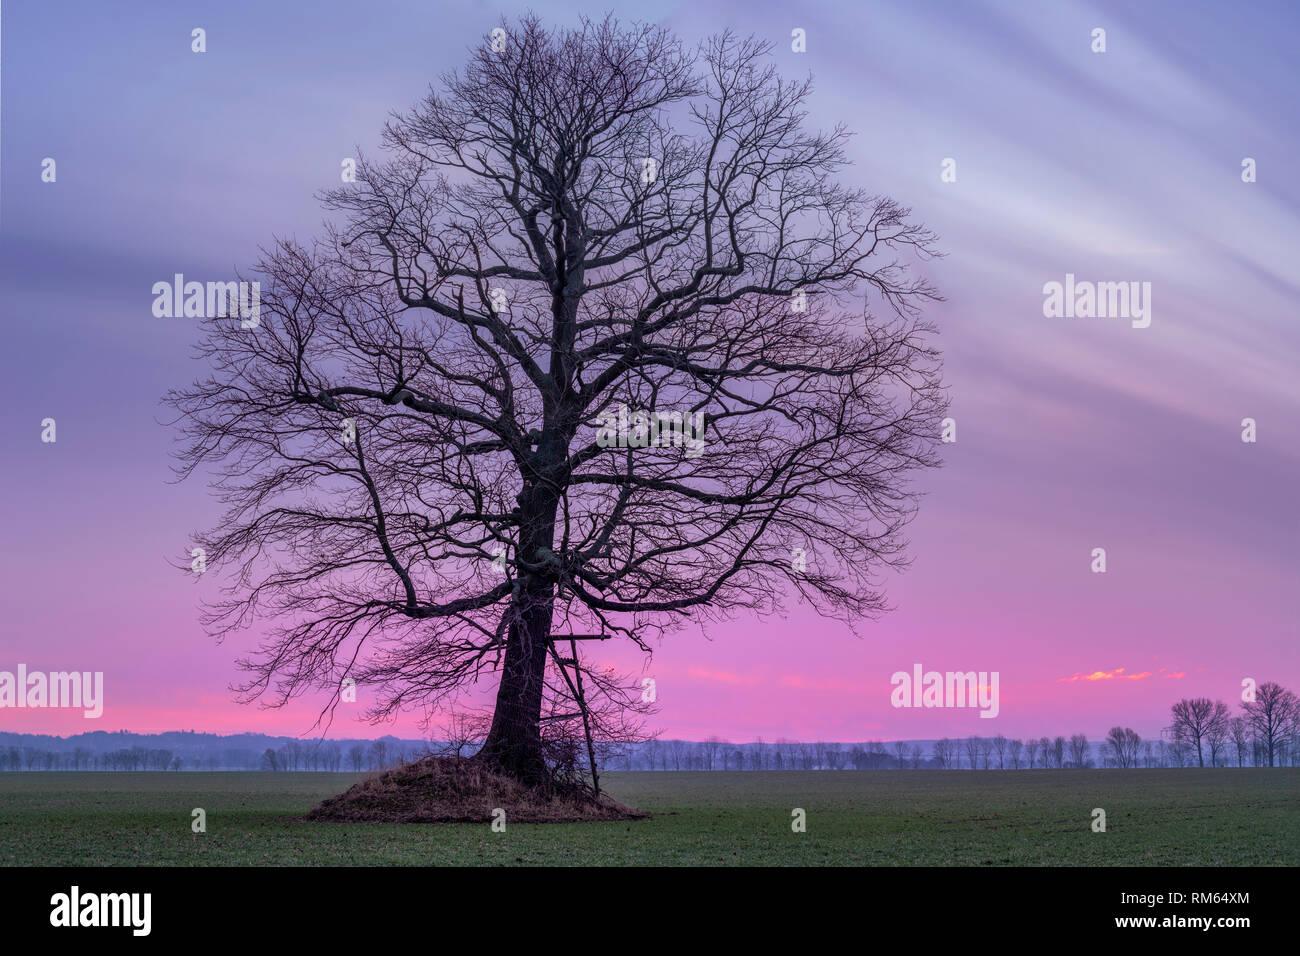 Morgenrot vor Sonnenaufgang im Winter Stock Photo